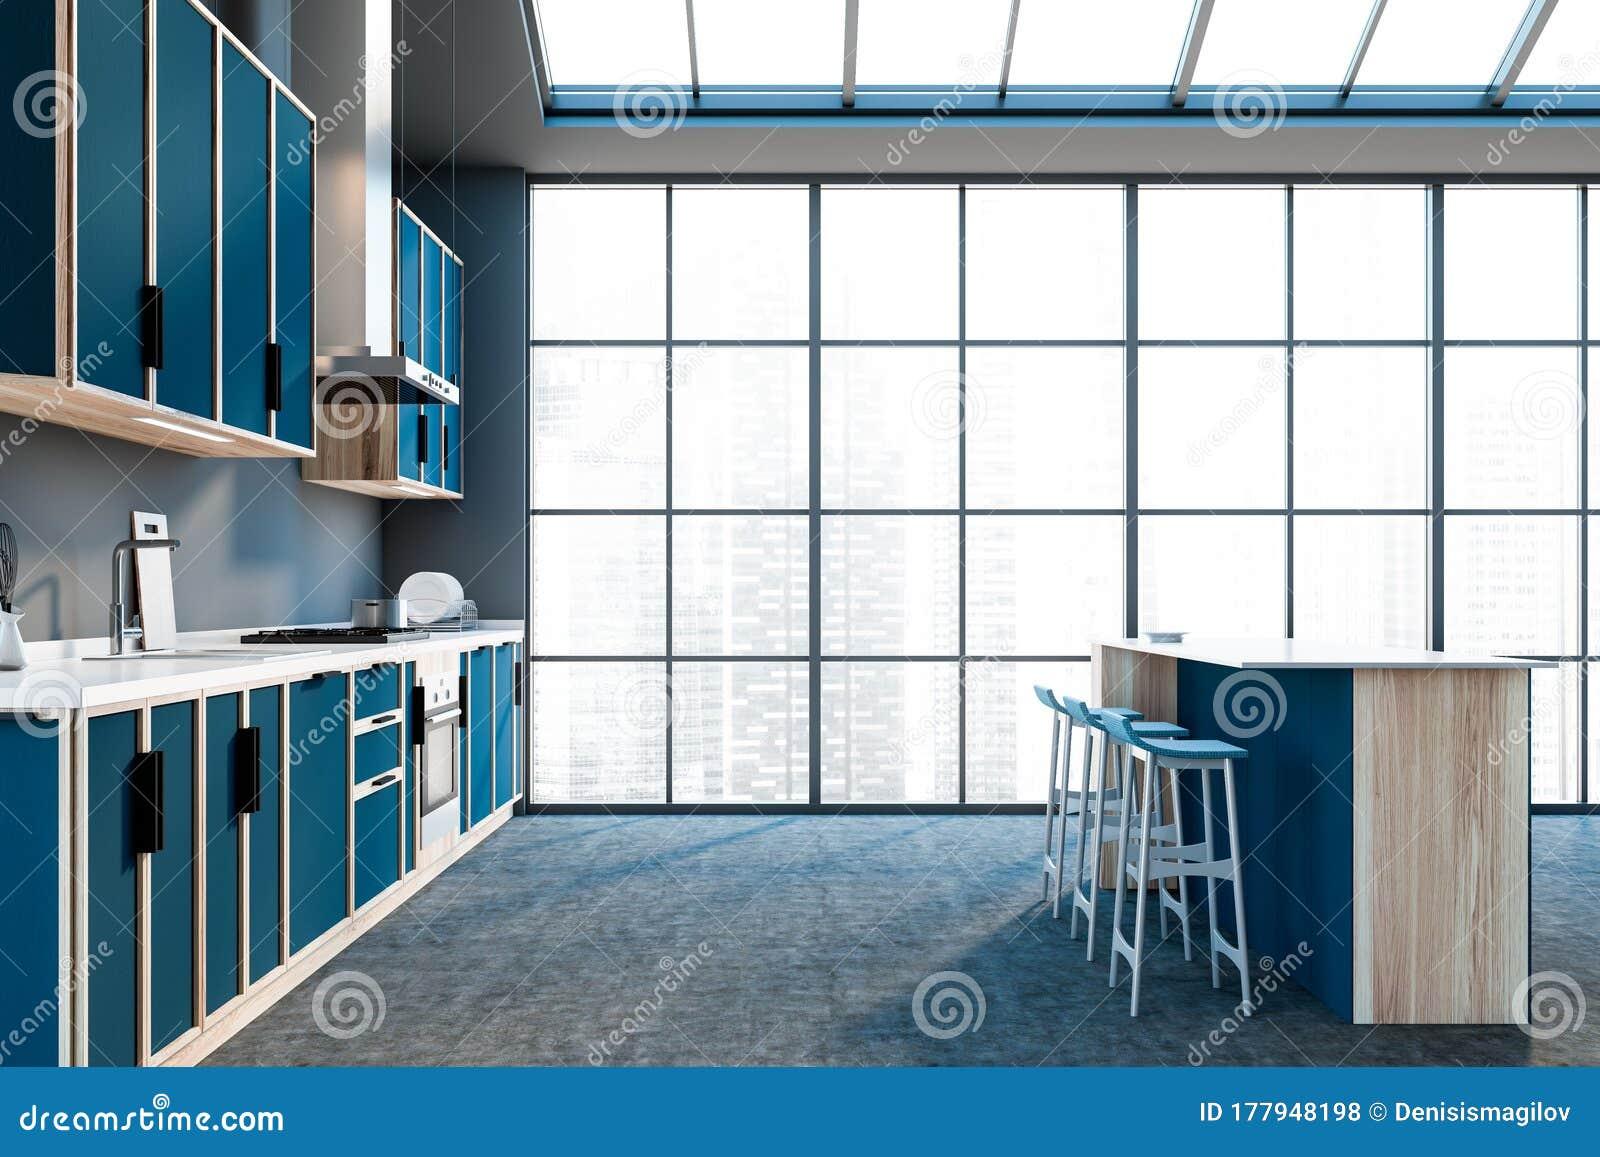 Panoramic Gray Kitchen Countertops And Bar Stock Illustration Illustration Of Floor Decor 177948198